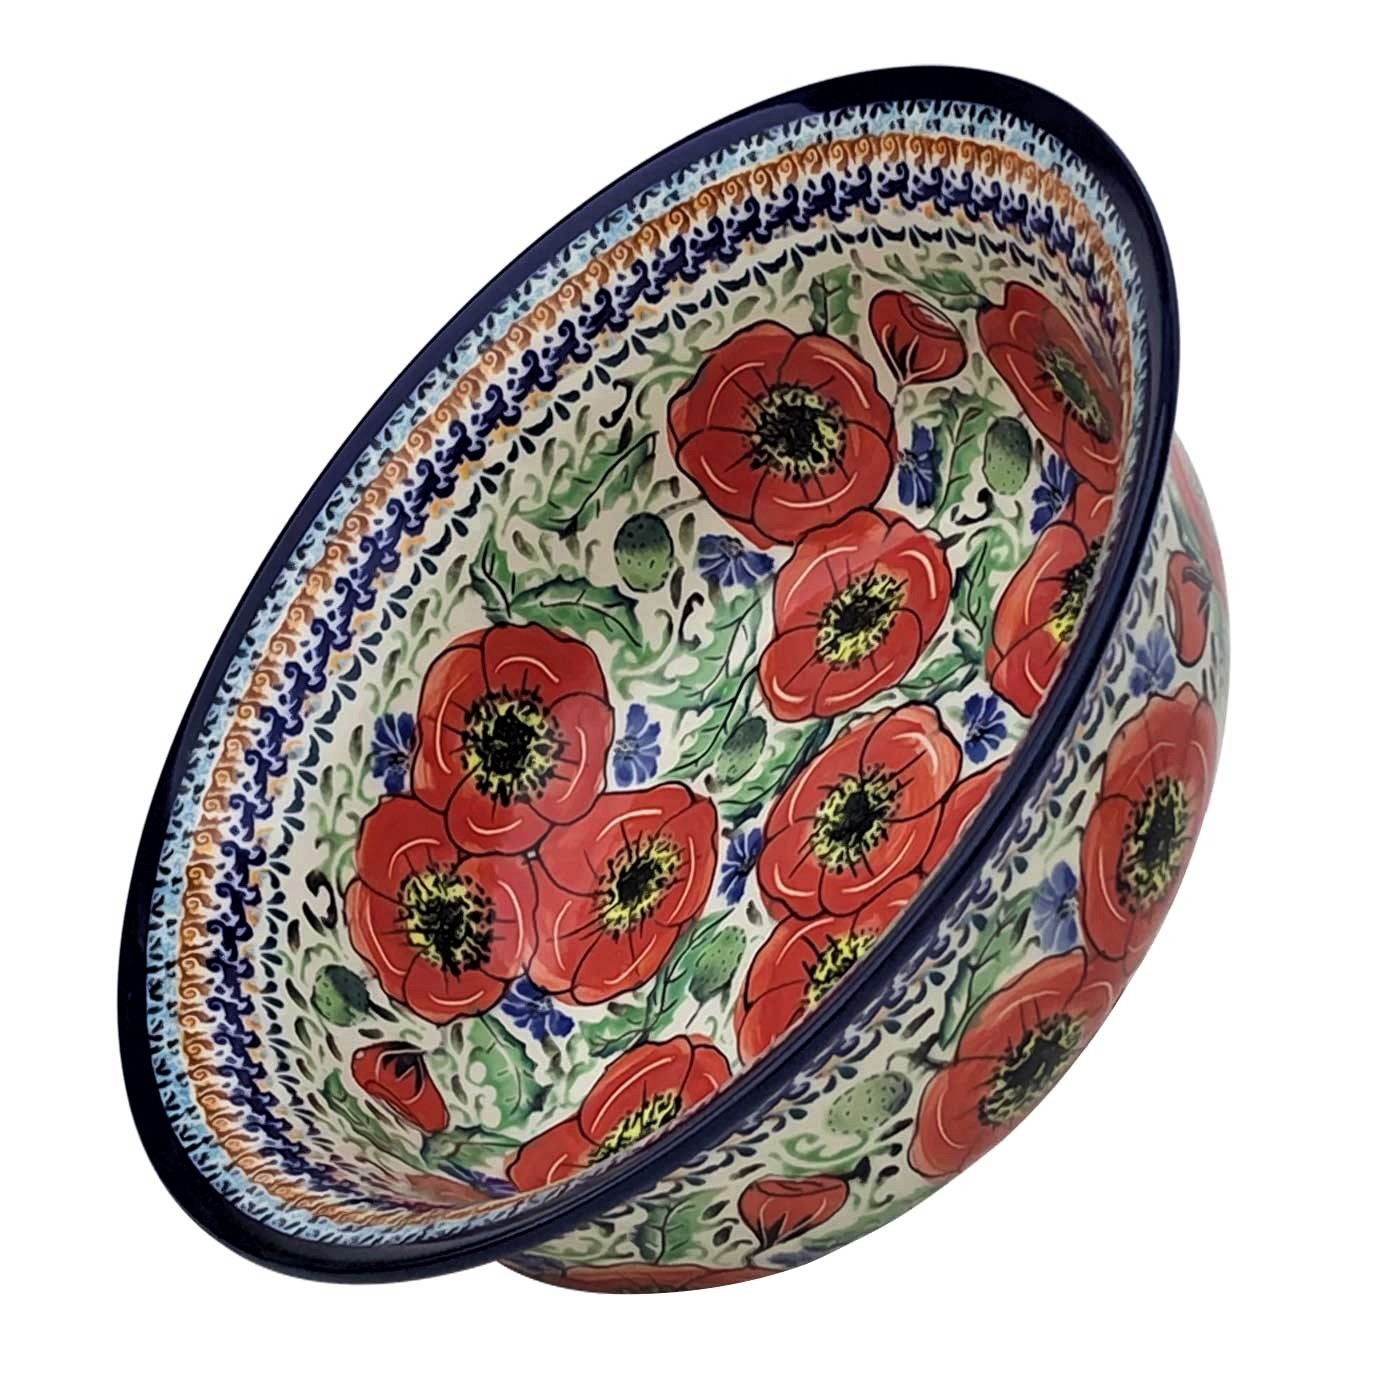 Pottery Avenue BELLISSIMA 61-oz Flared Top Stoneware Bowl  - 1605-247EX-UNIKAT - 1605-247EX